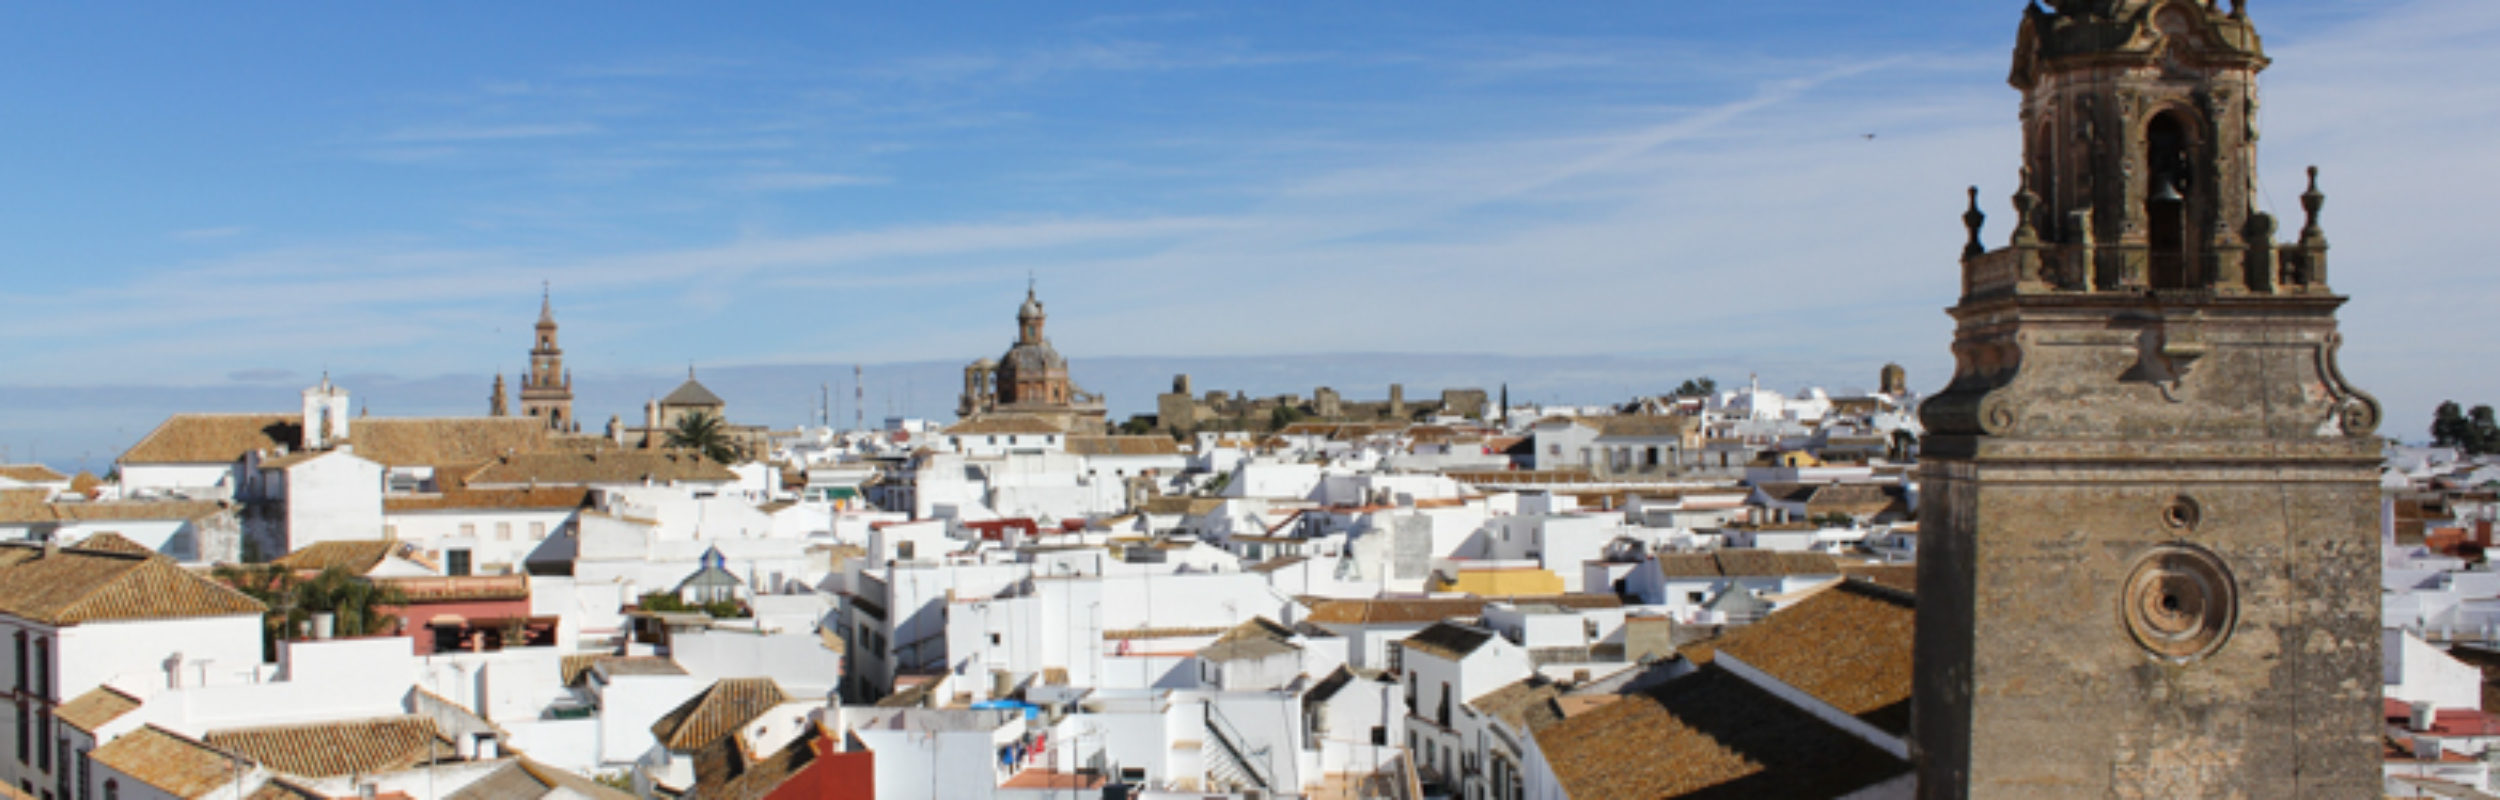 Road-trip en Andalousie #7 : Carmona, un village andalou typique !